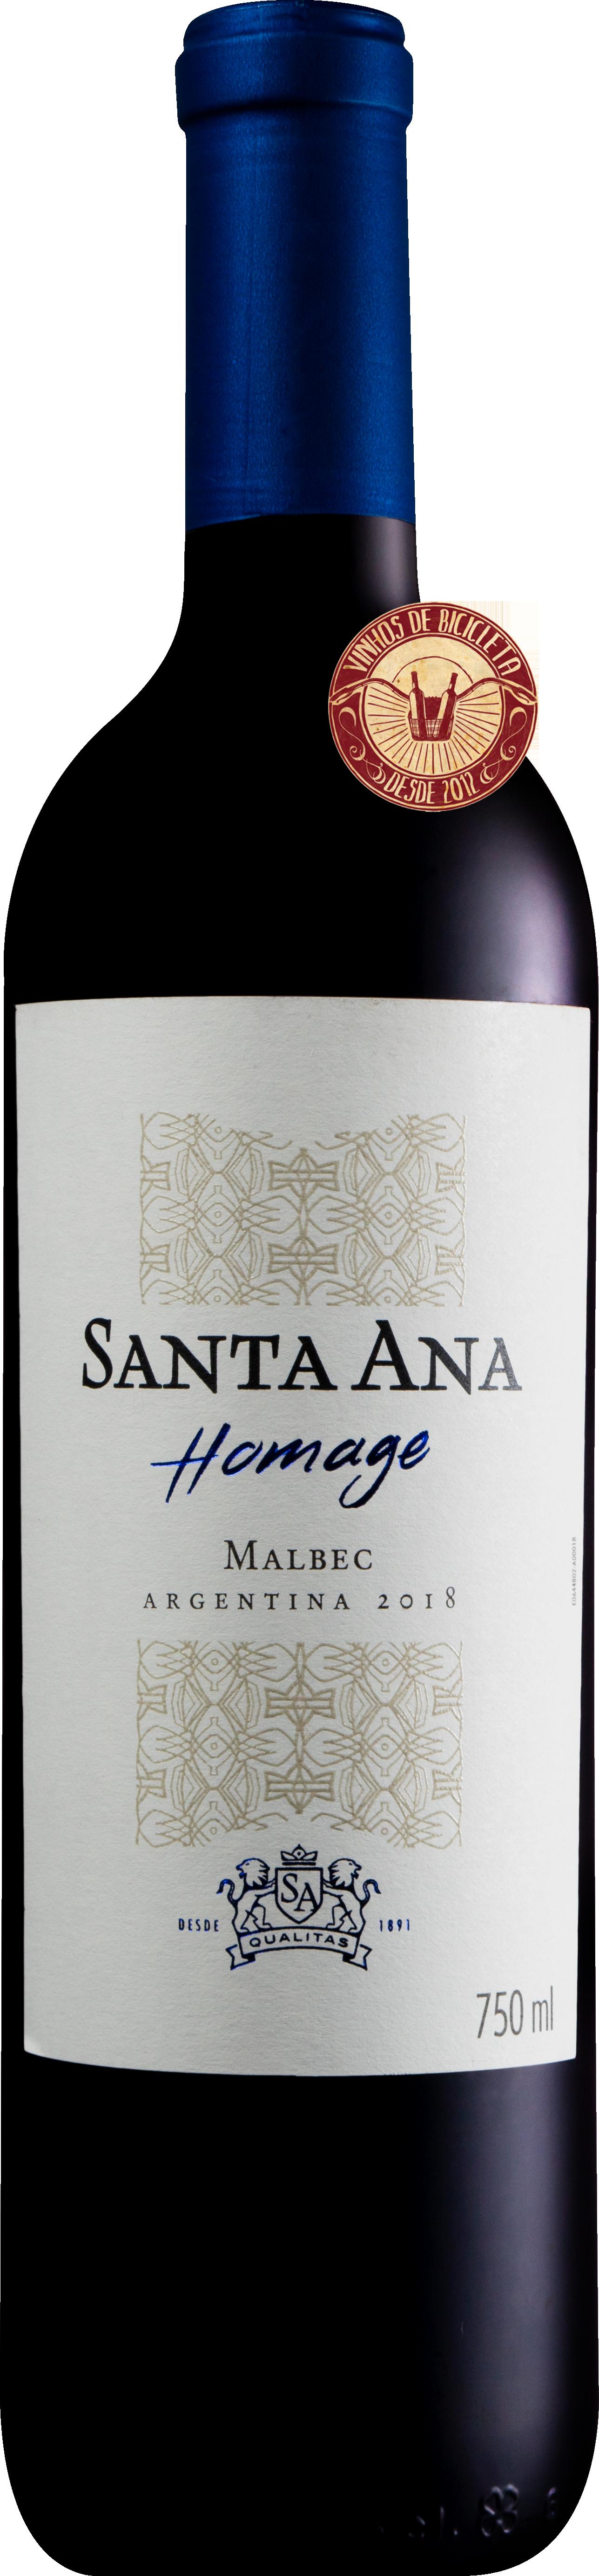 Santa Ana Homage Malbec